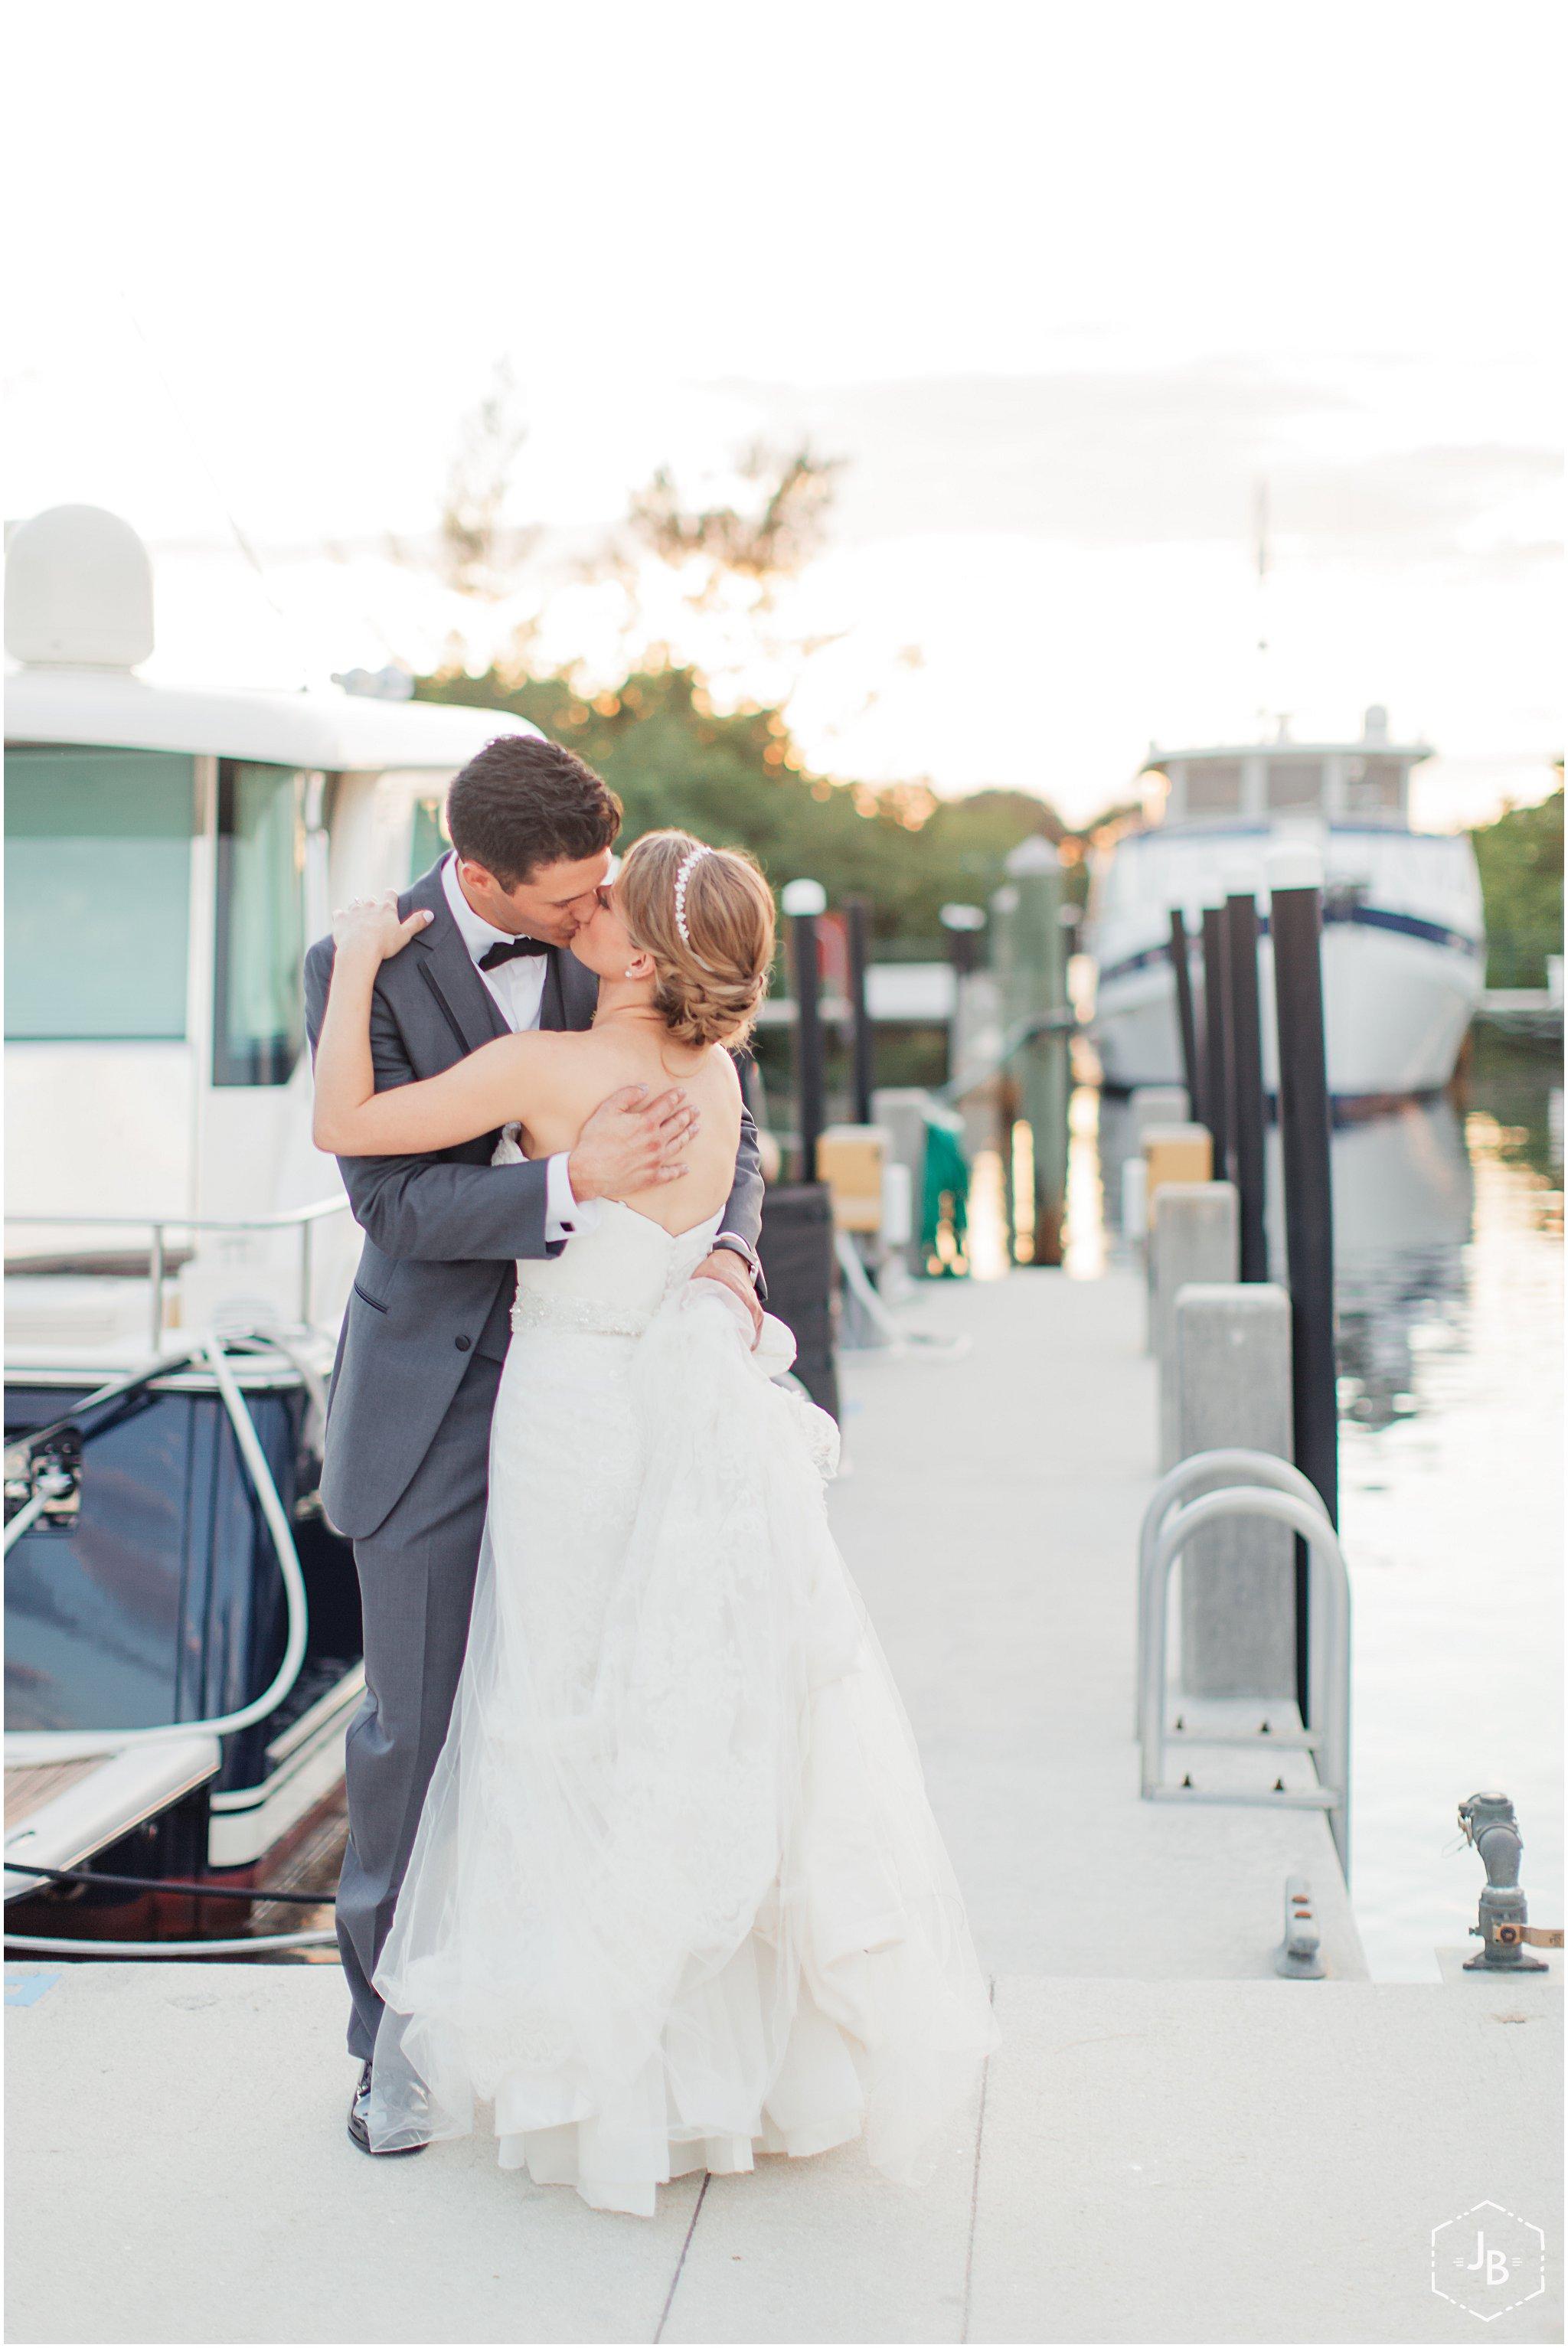 WeddingandEngagementFloridaPhotographer_0379.jpg